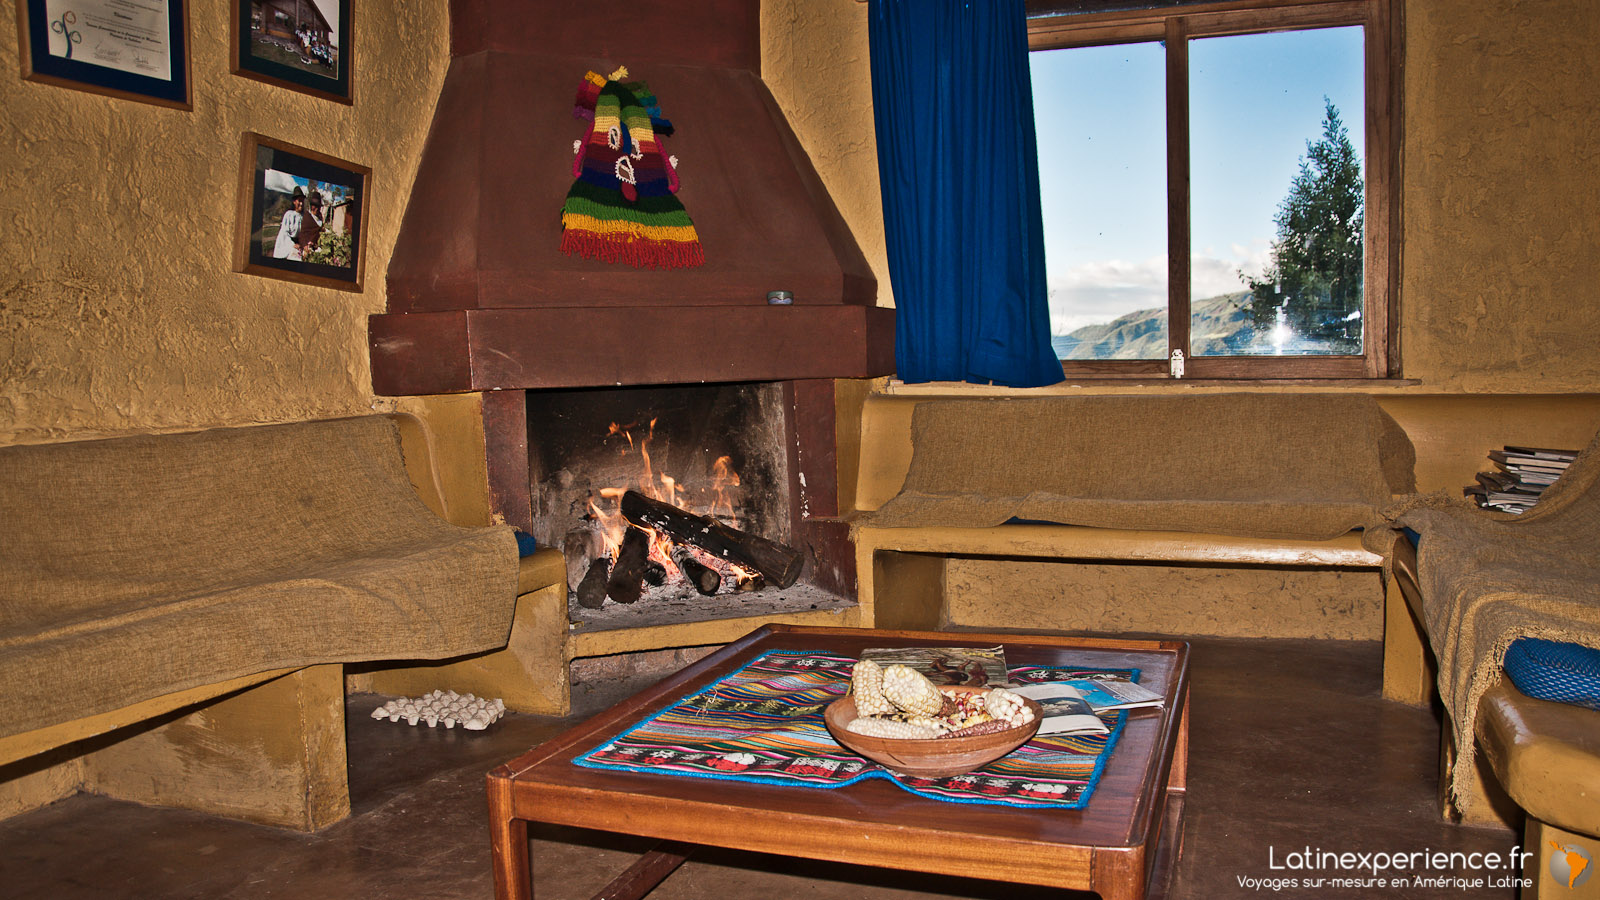 Equateur - Communautaire Kasani  - Latinexperience voyages